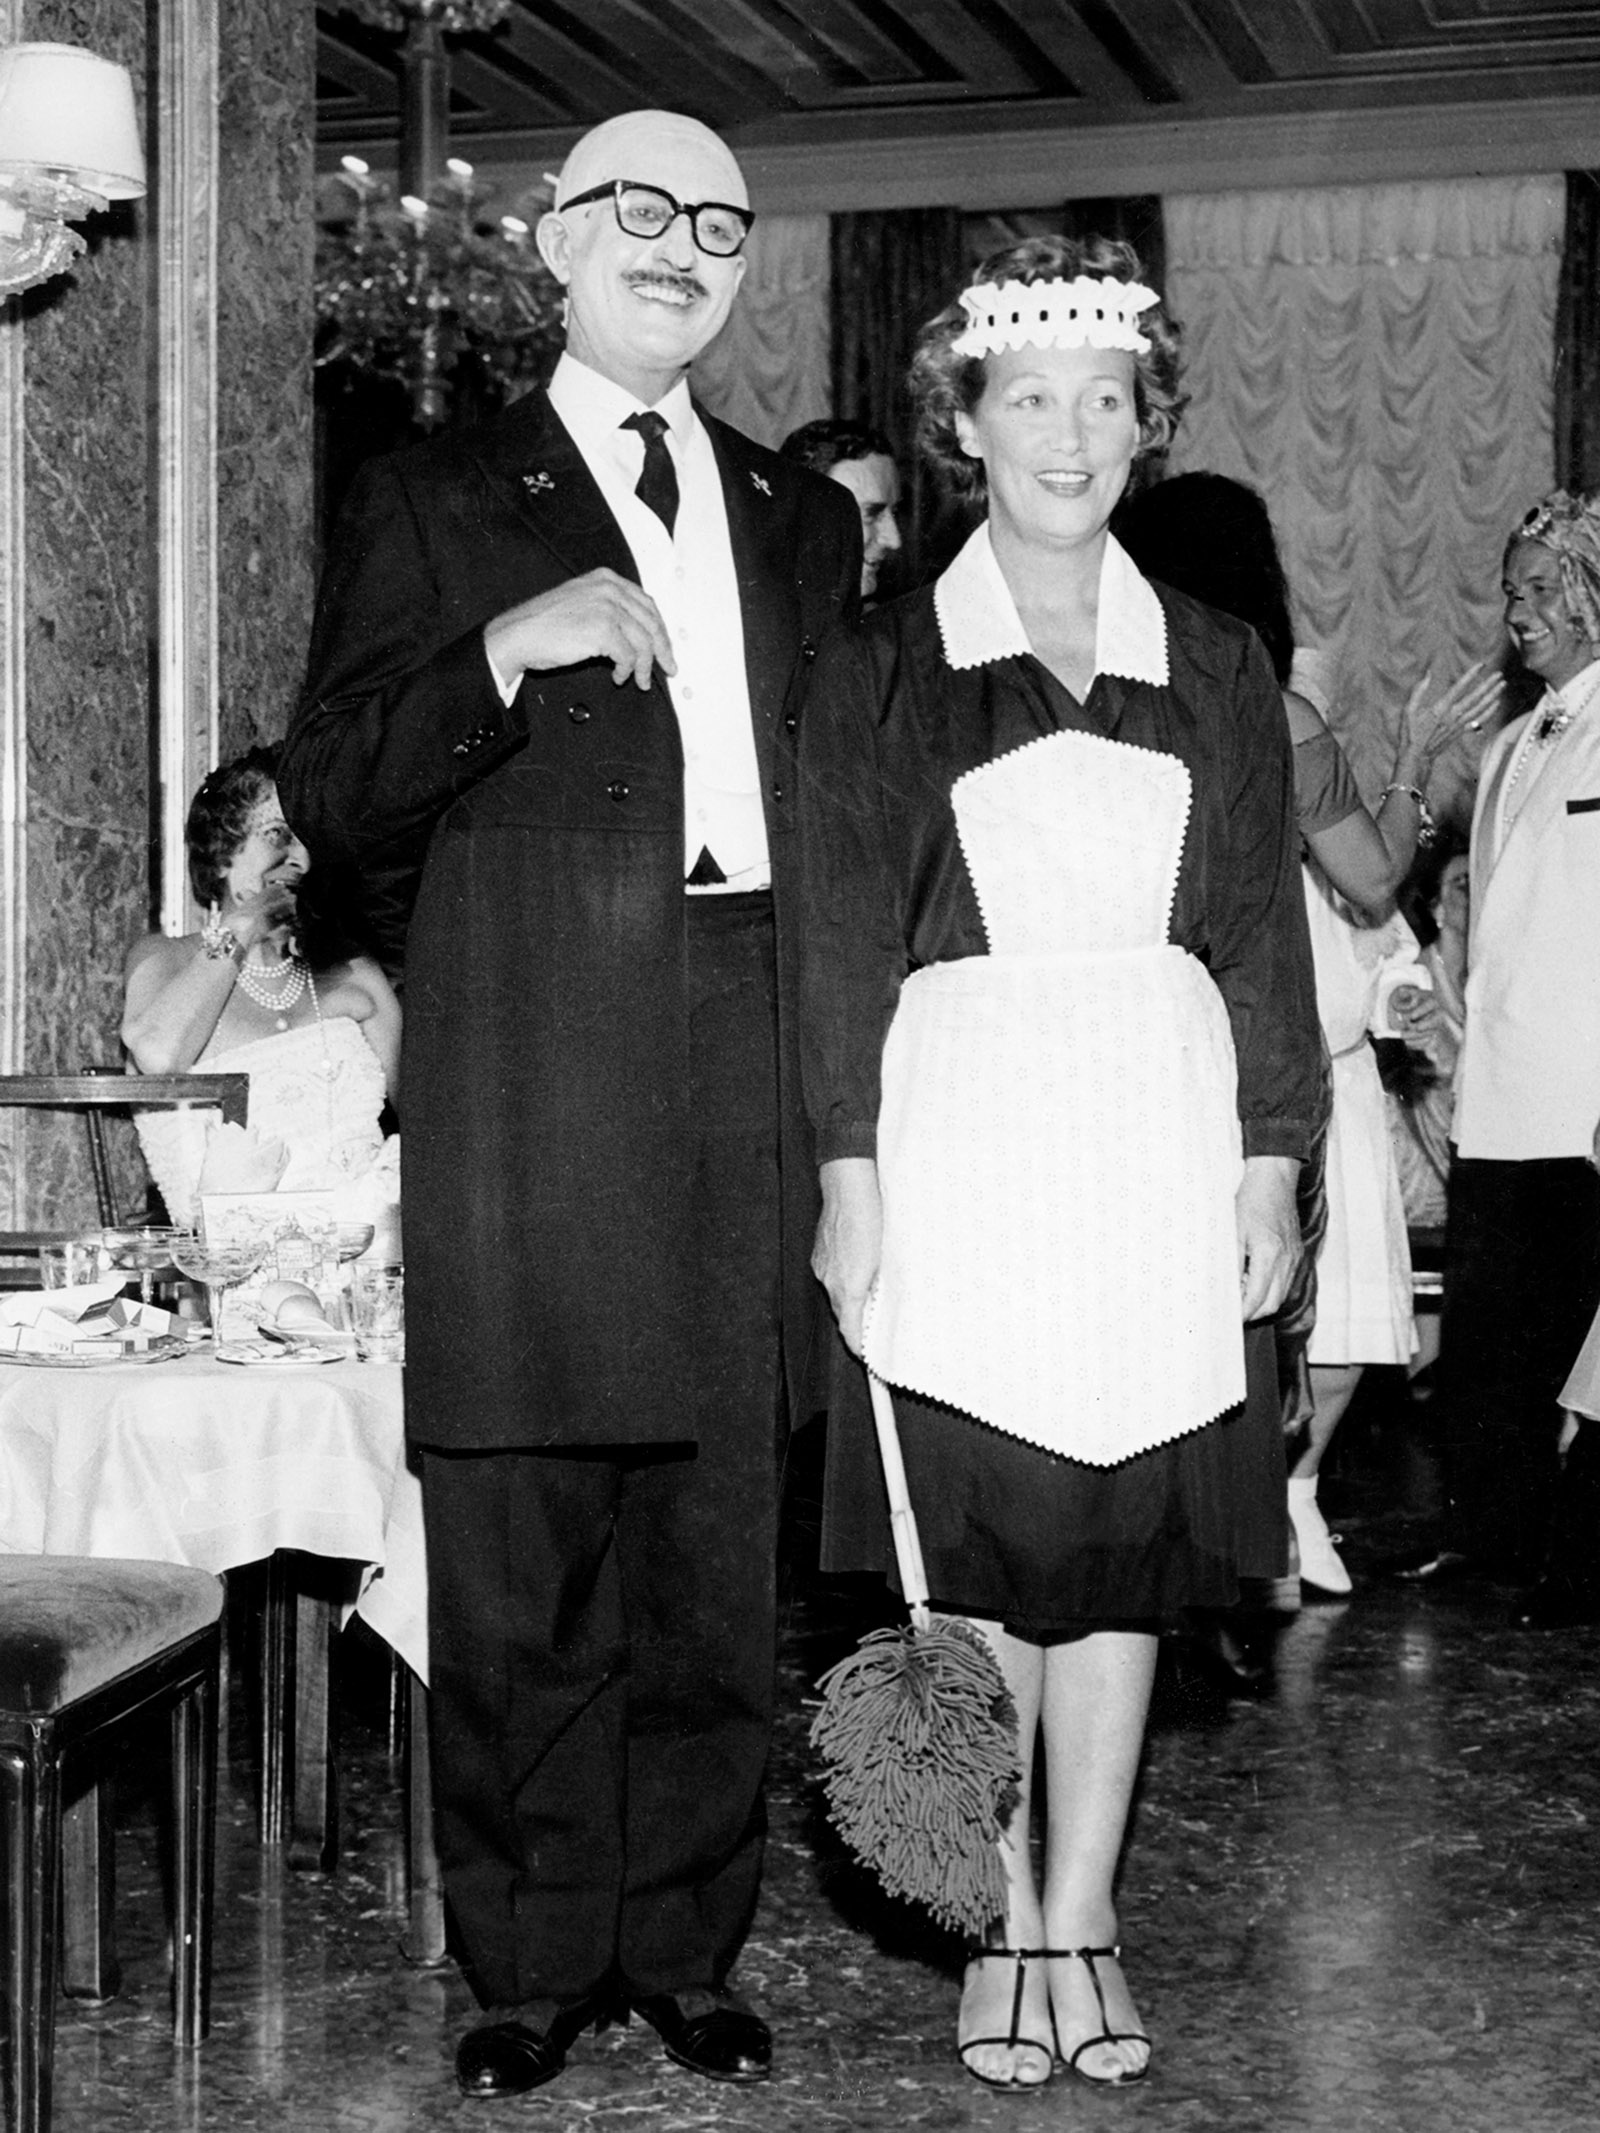 Count Guido Brandolini and Drue Heinz at a party hosted by Elsa Maxwell, Hotel Danieli, Venice, circa 1959